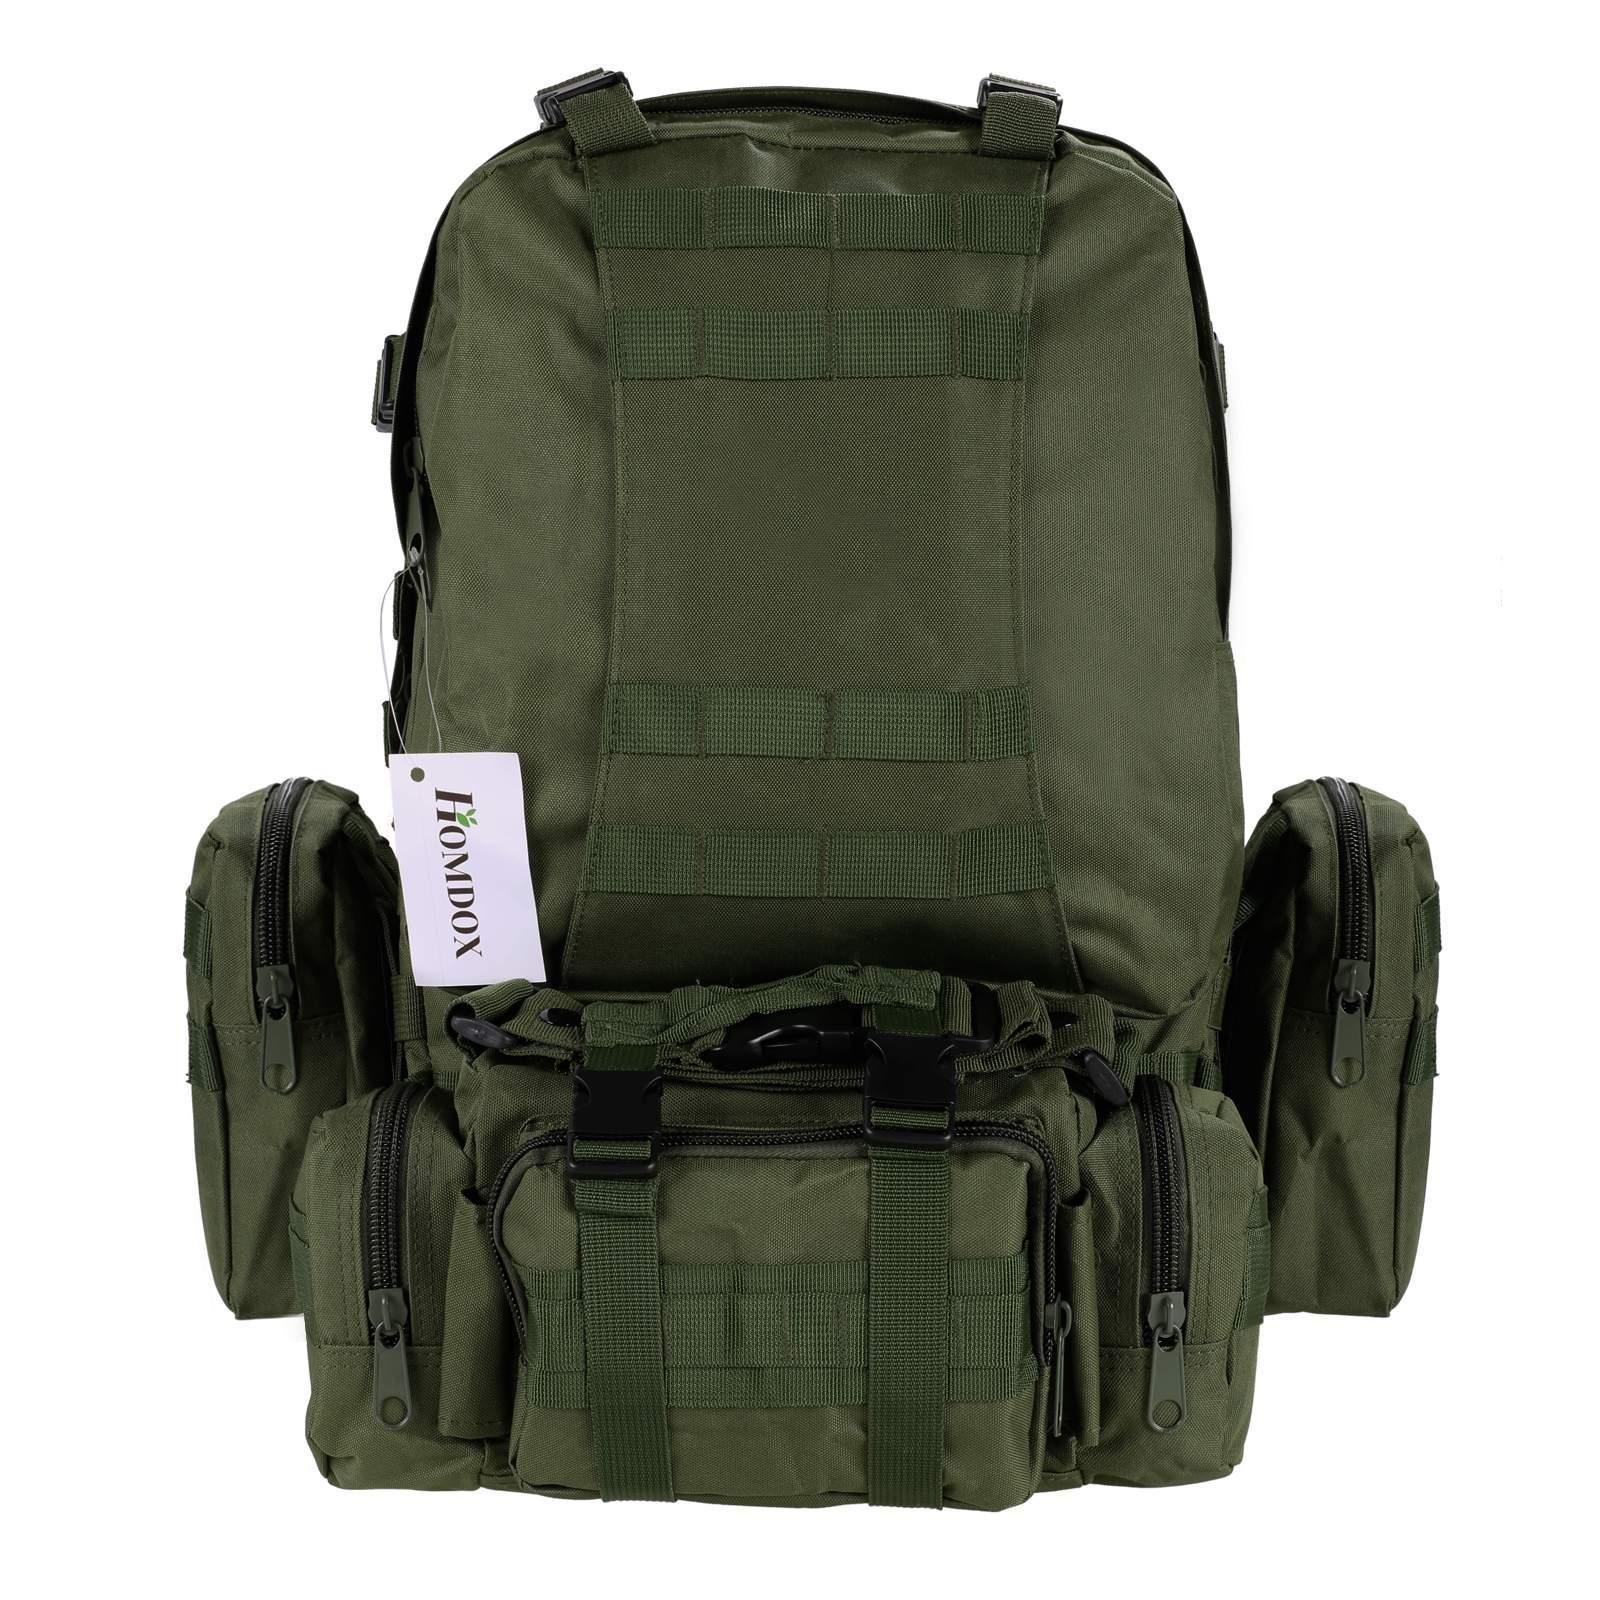 2ee76ff0b1e0 Fashion Detachable 55L Pack large waterproof Military Tactical Backpack  Rucksacks Outdoor Sport Camping Bag - Walmart.com